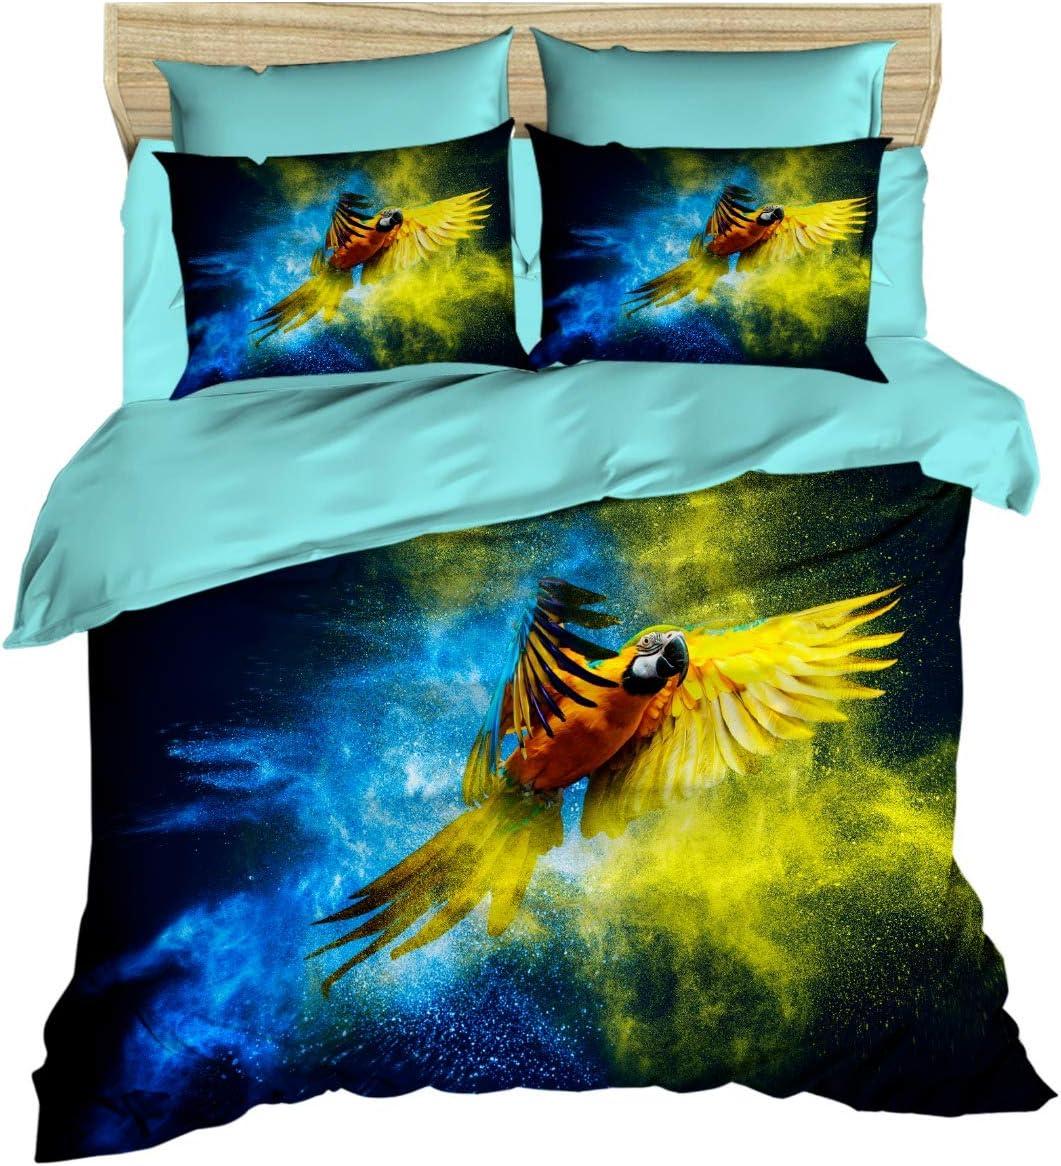 Parrot Bedding Set 3D Printed 100% お求めやすく価格改定 ショッピング Duvet Cotton Themed C